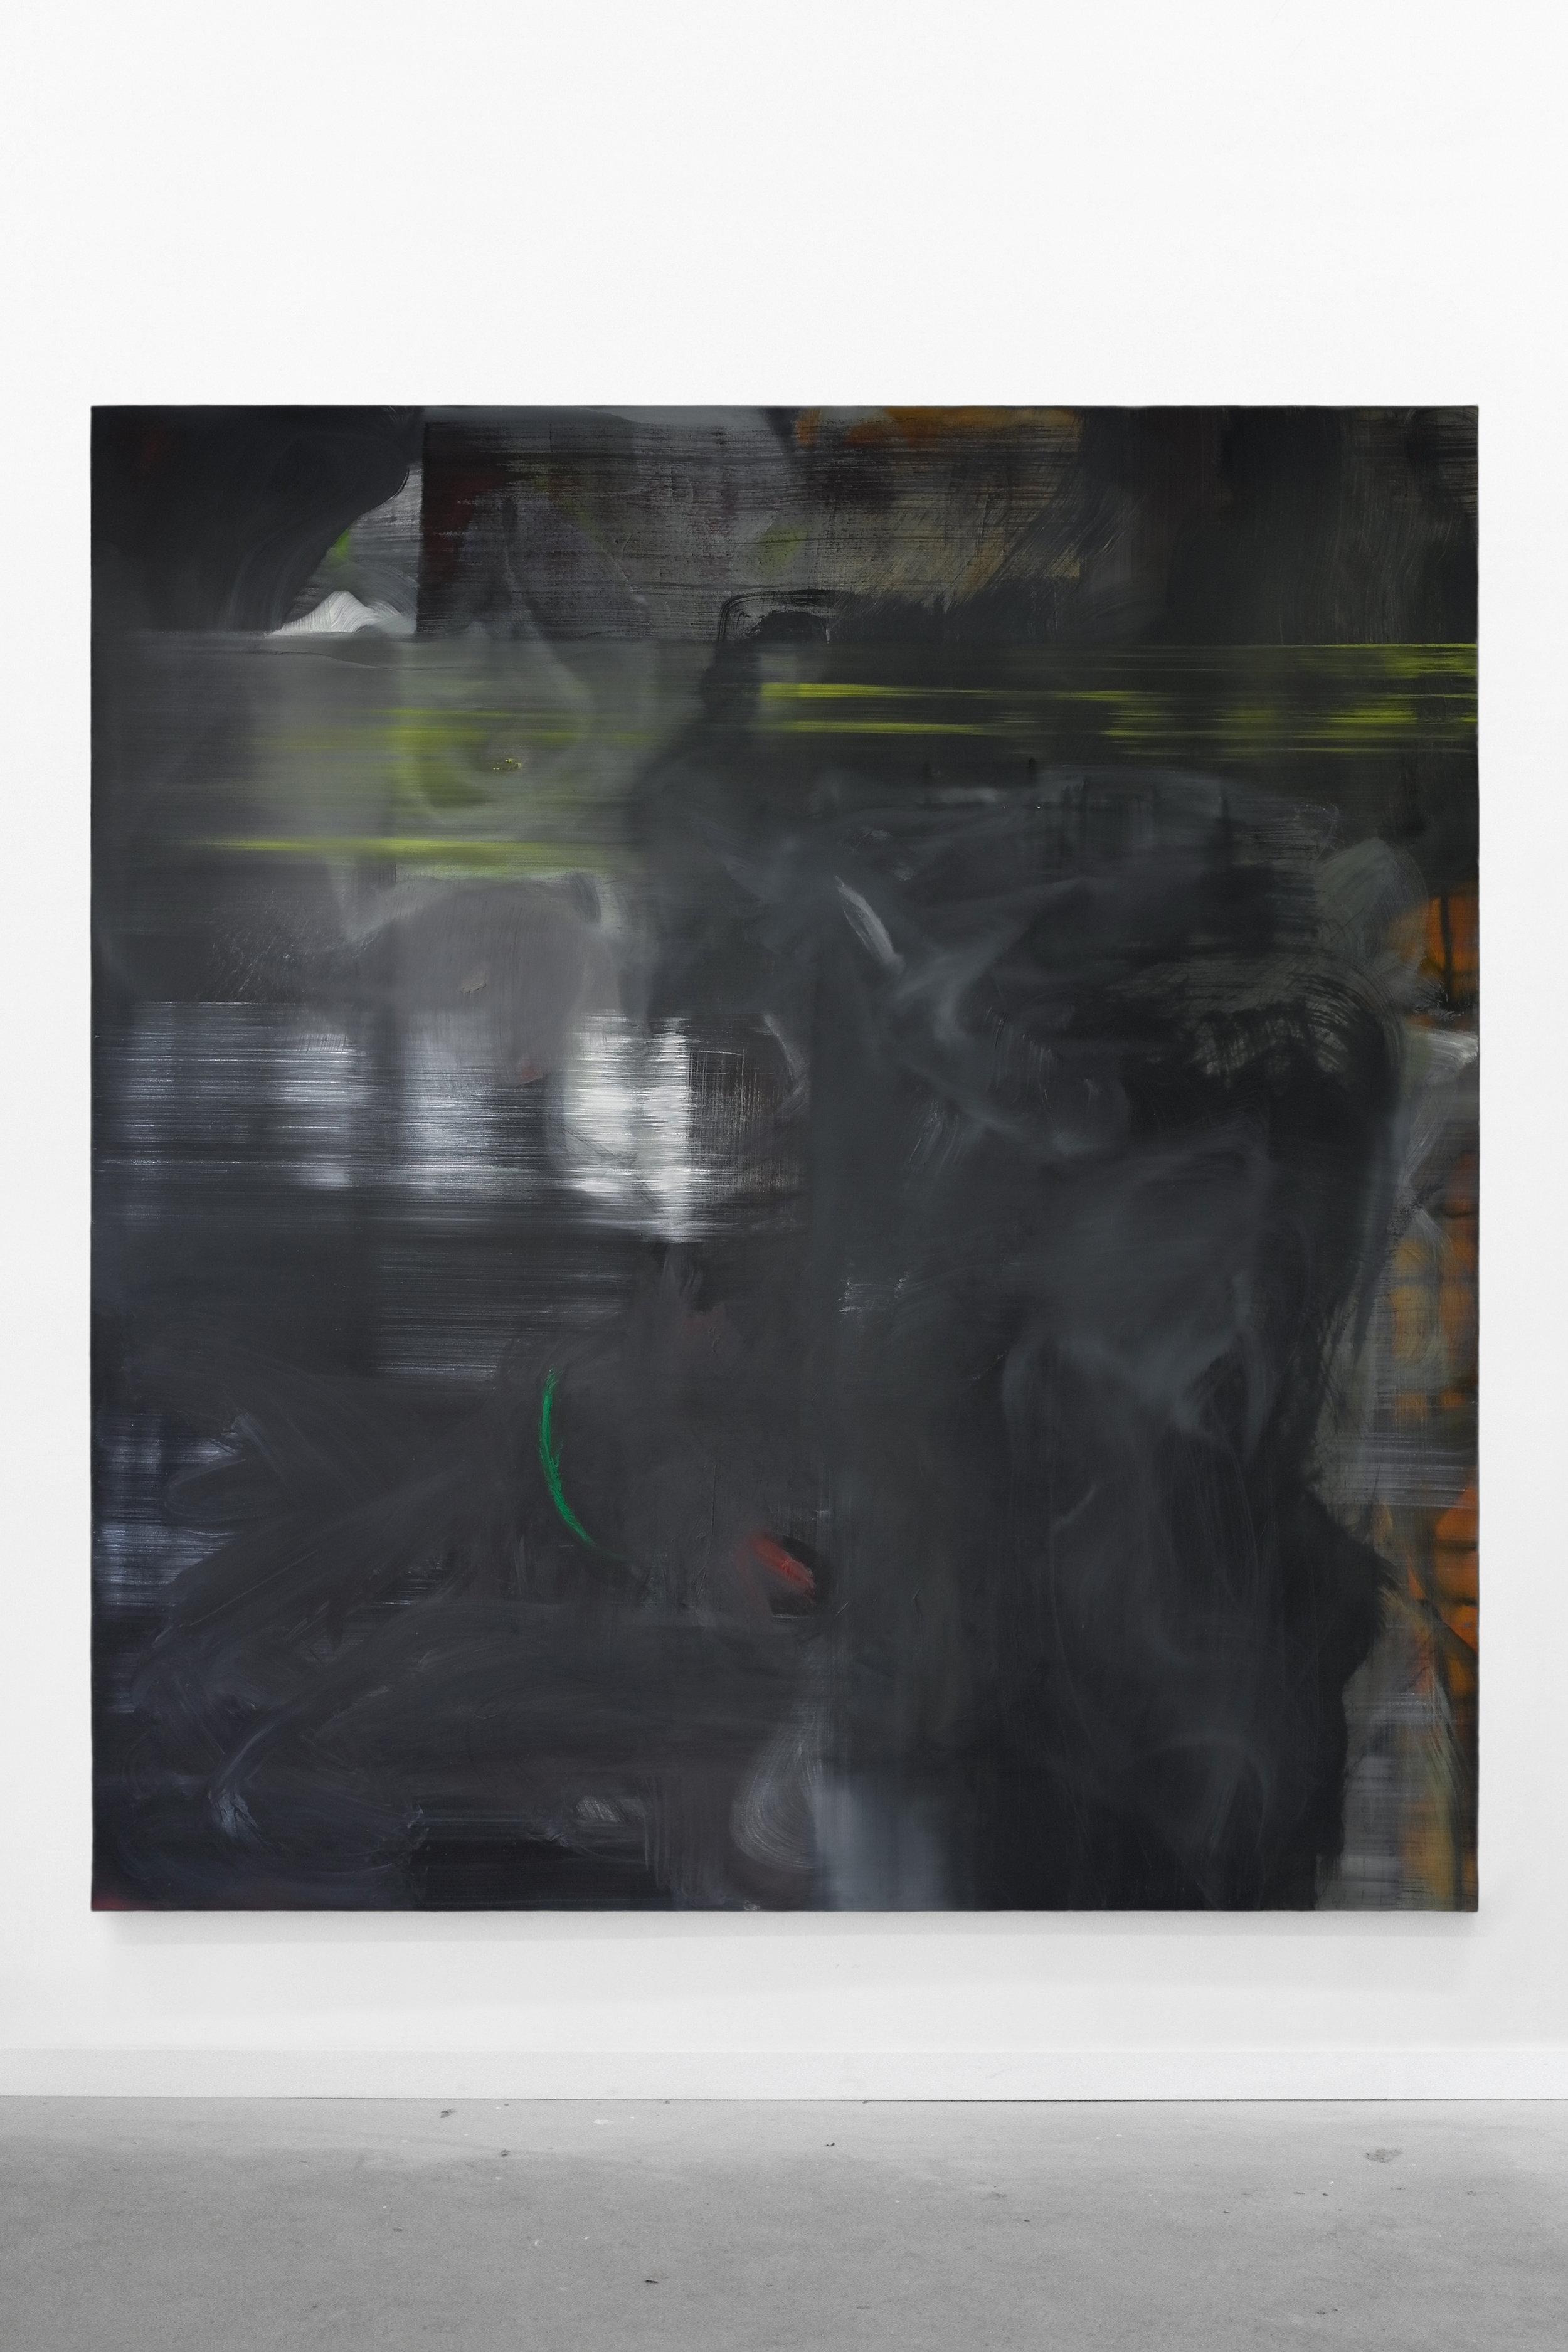 Sonya Derviz, Dancers II, oil on canvas, 220 x 200cm, 2018